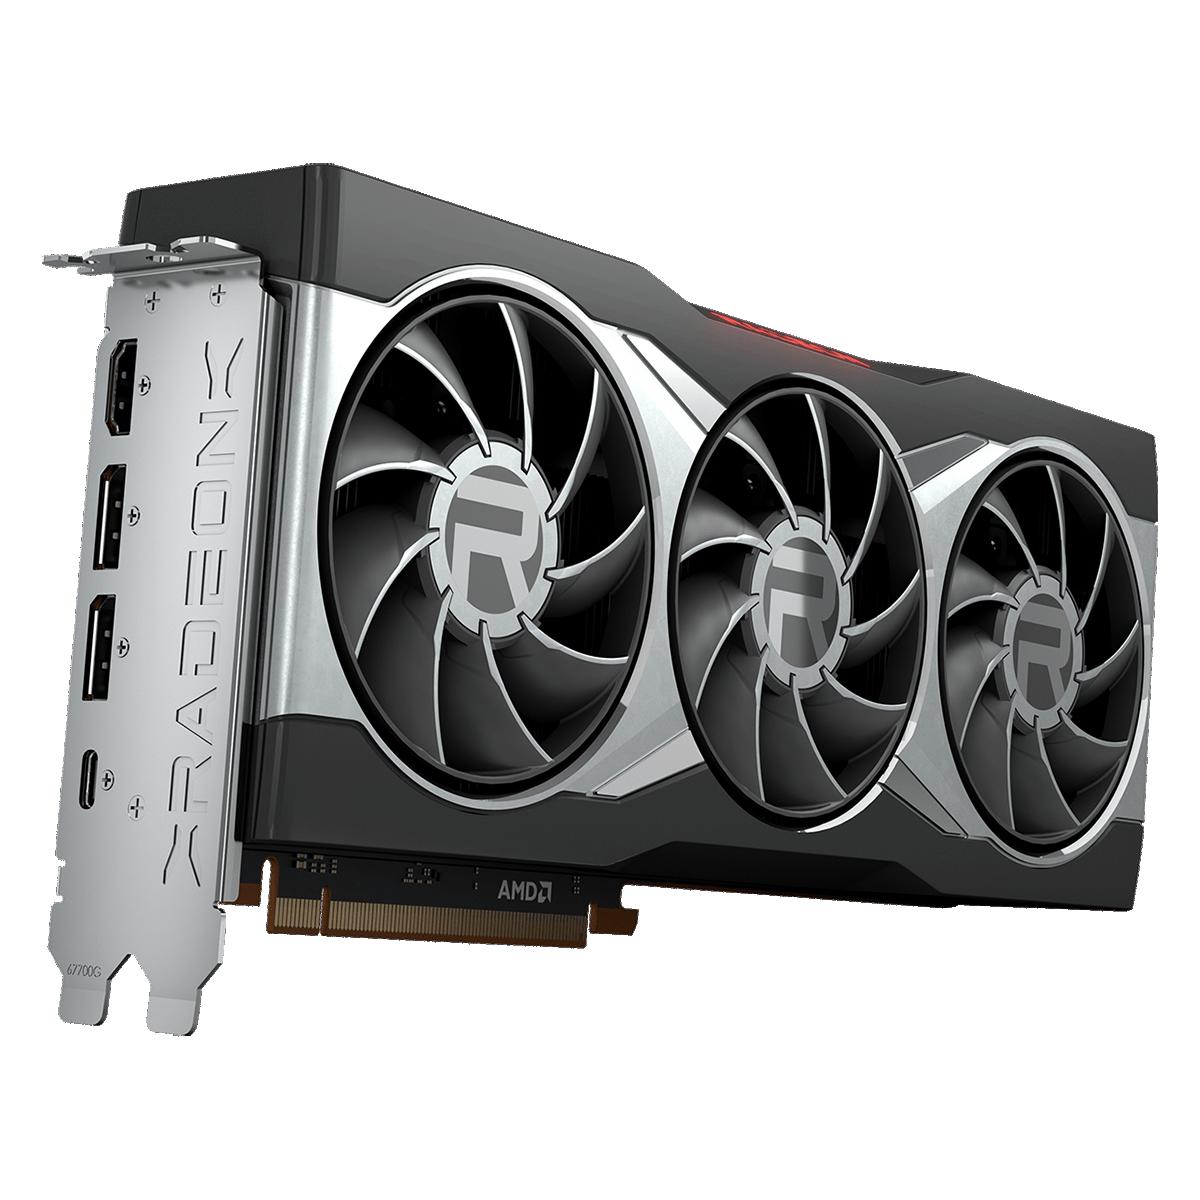 Placa de Vídeo ASUS Radeon RX 6900 XT, 16GB, GDDR6, 256bit, 90YV0GG0-U0NA00